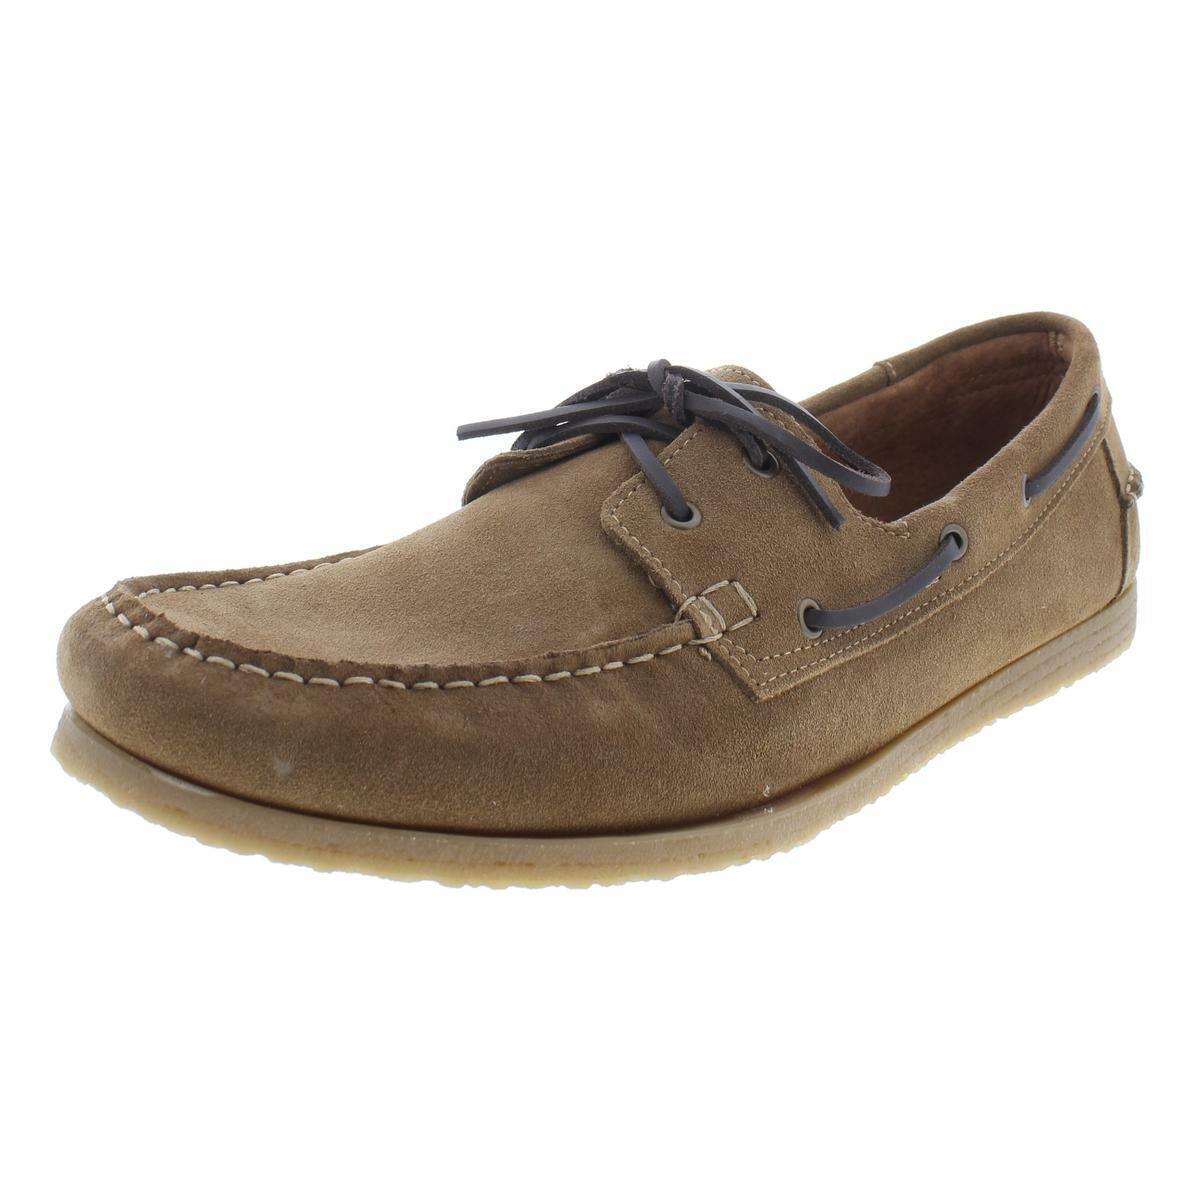 Steve Madden Mens Buoy Brown Suede Loafer Boat shoes 9 Medium (D) BHFO 9847